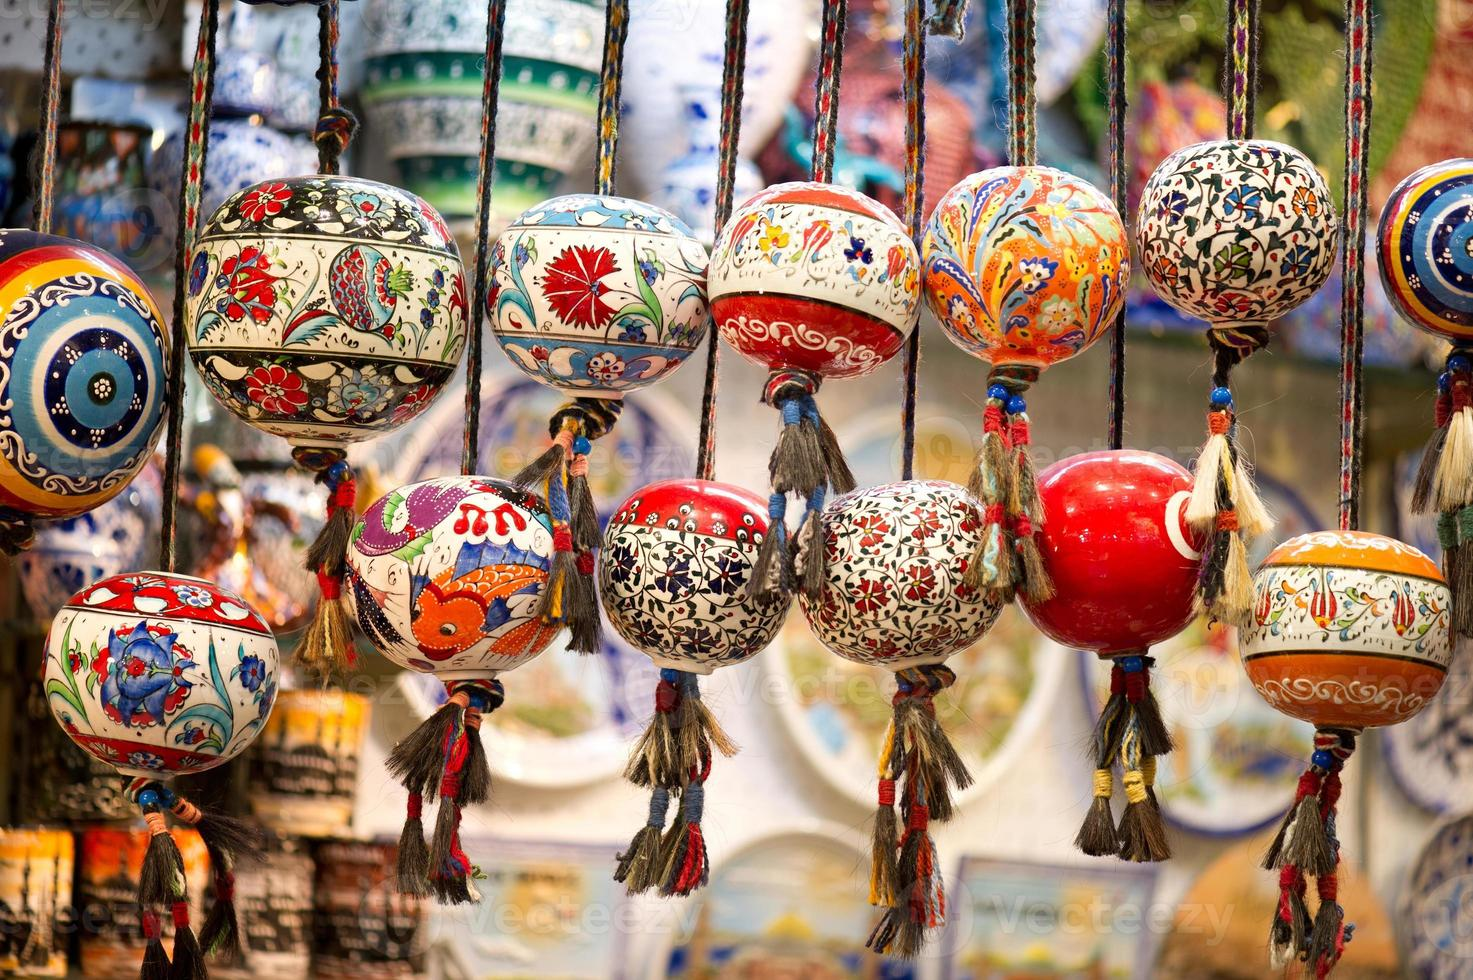 orinetal beads in grand bazaar, istanbul, turkey foto